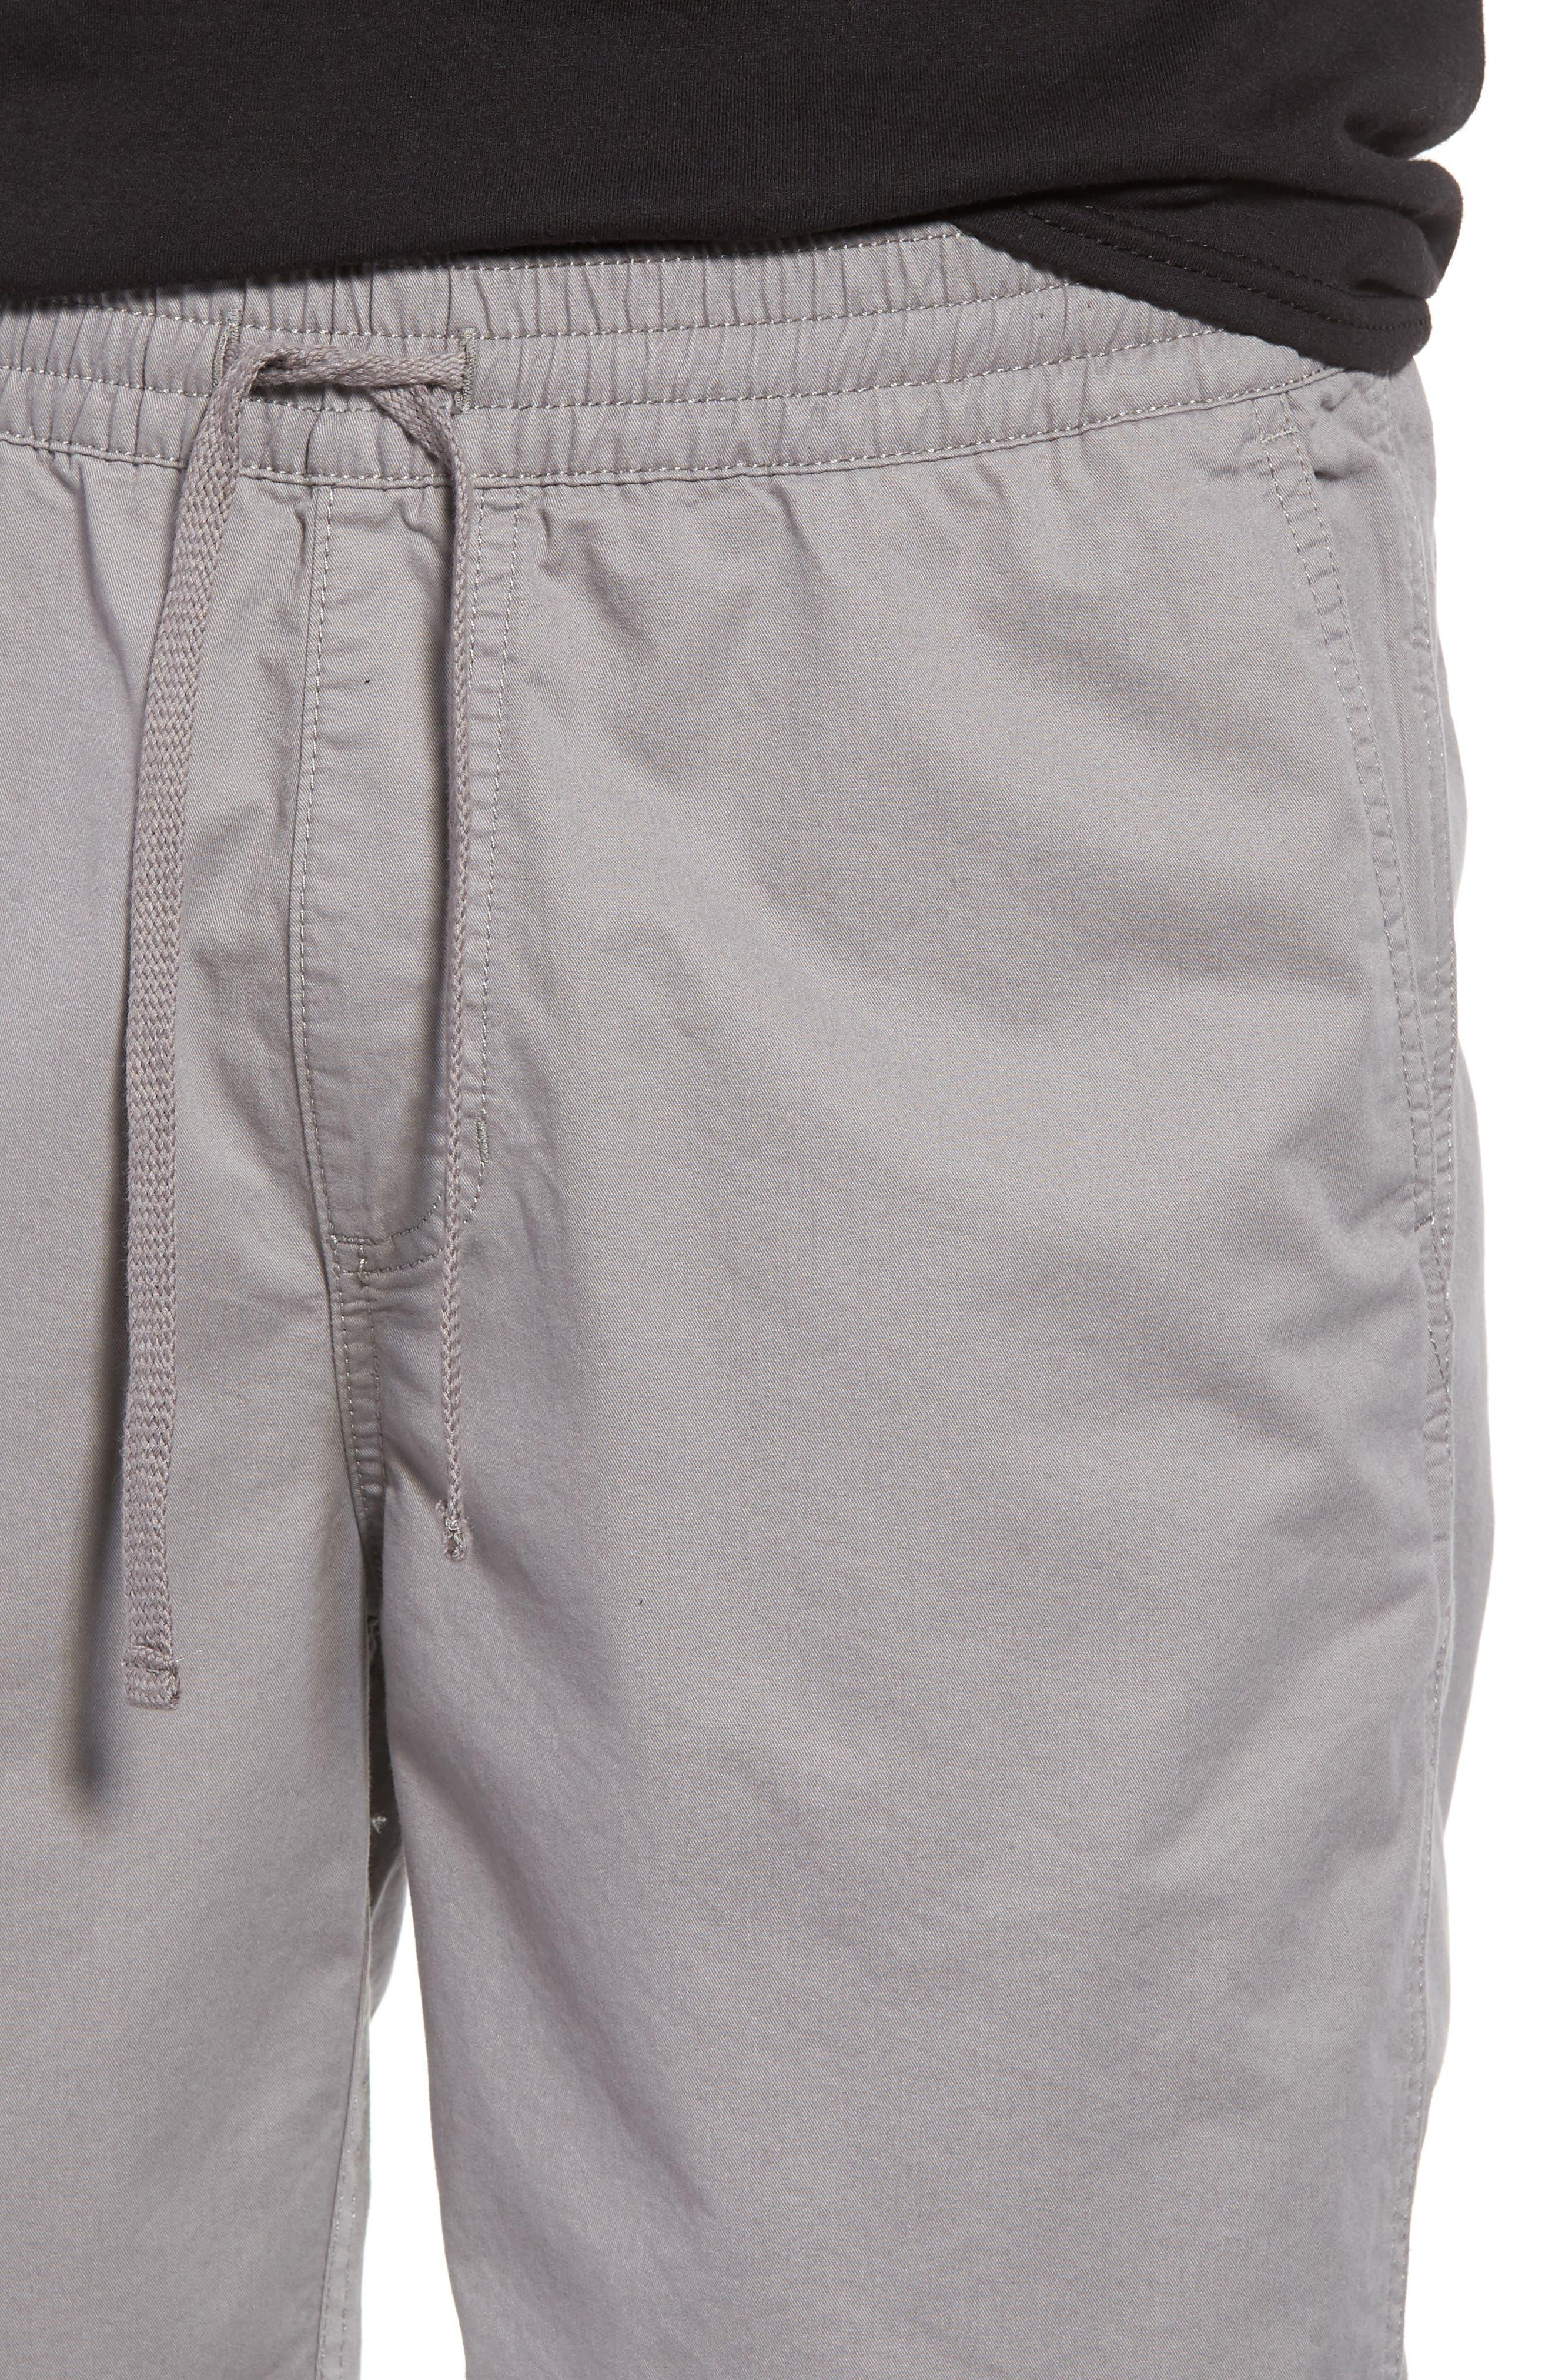 Range Drawstring Shorts,                             Alternate thumbnail 4, color,                             Frost Grey